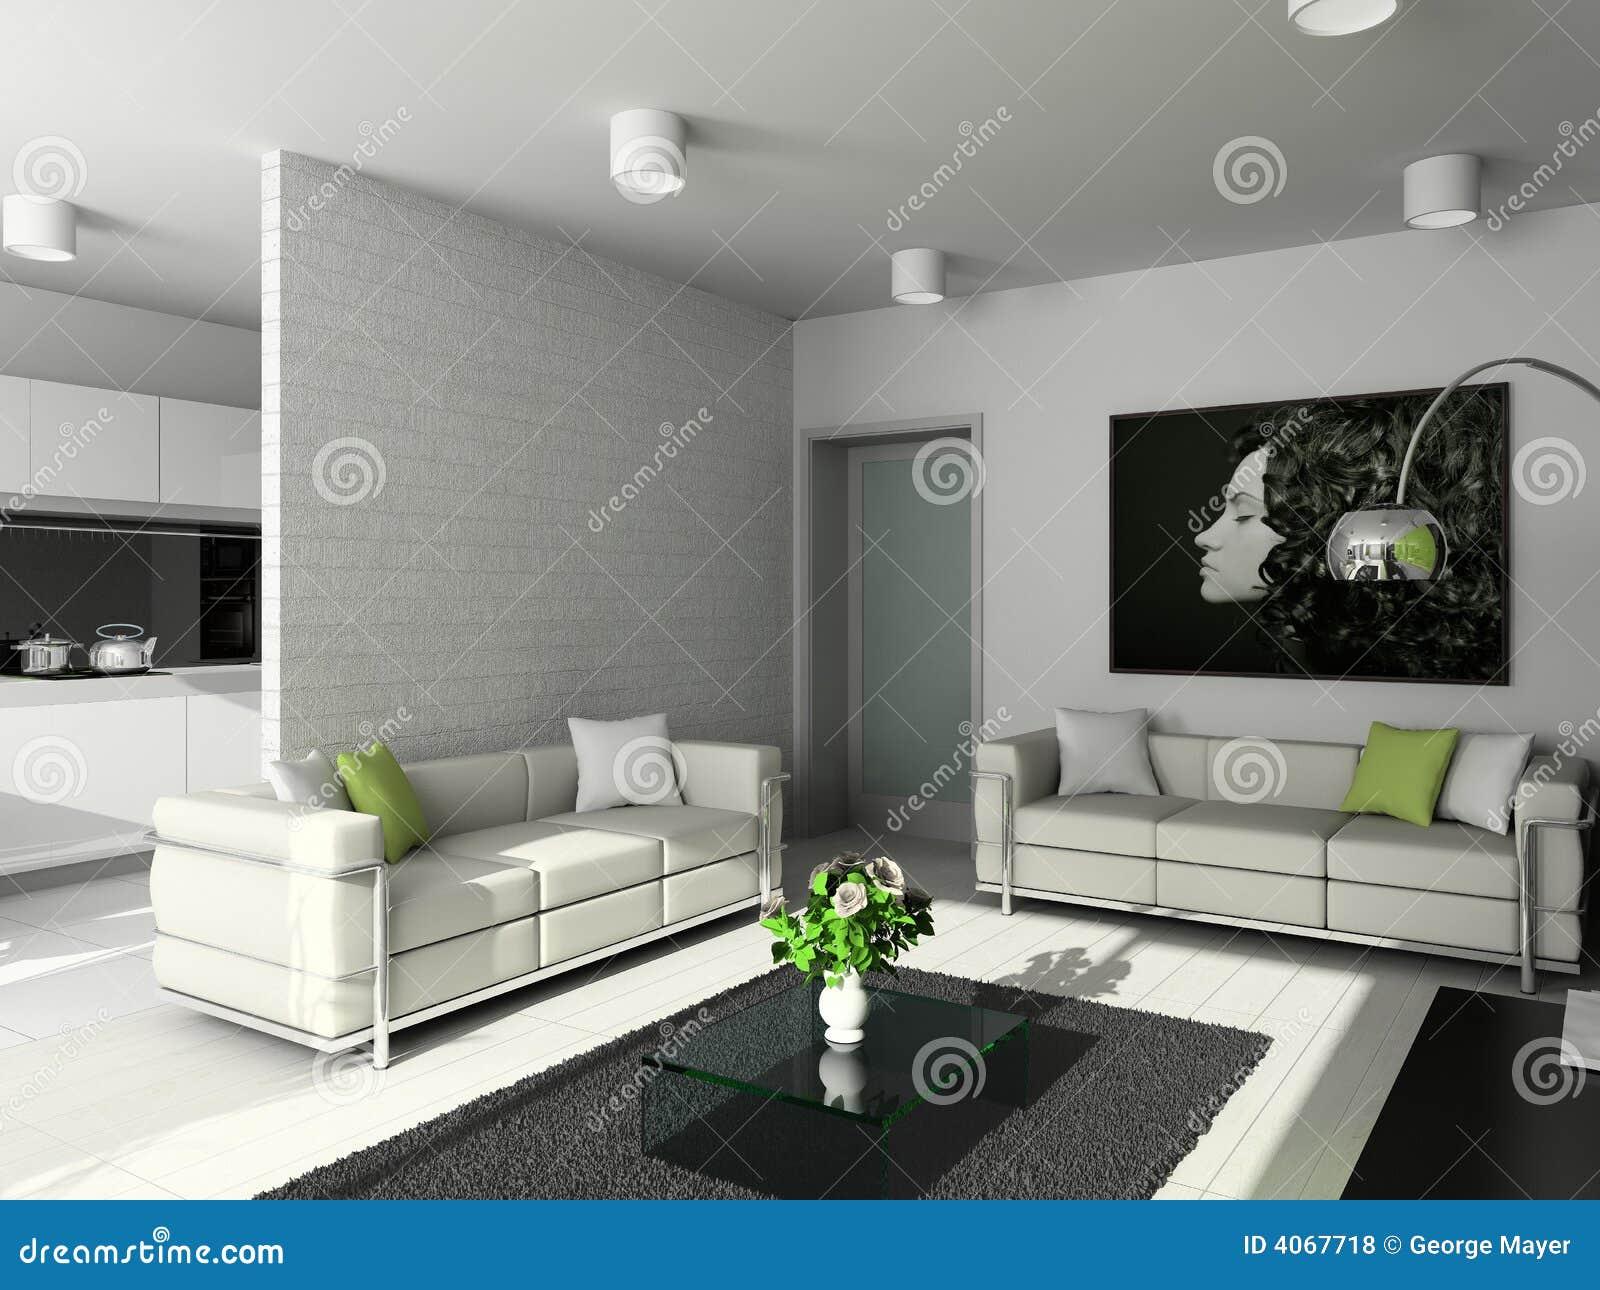 Modern Design Of Interior Royalty Free Stock Photos Image 4067718